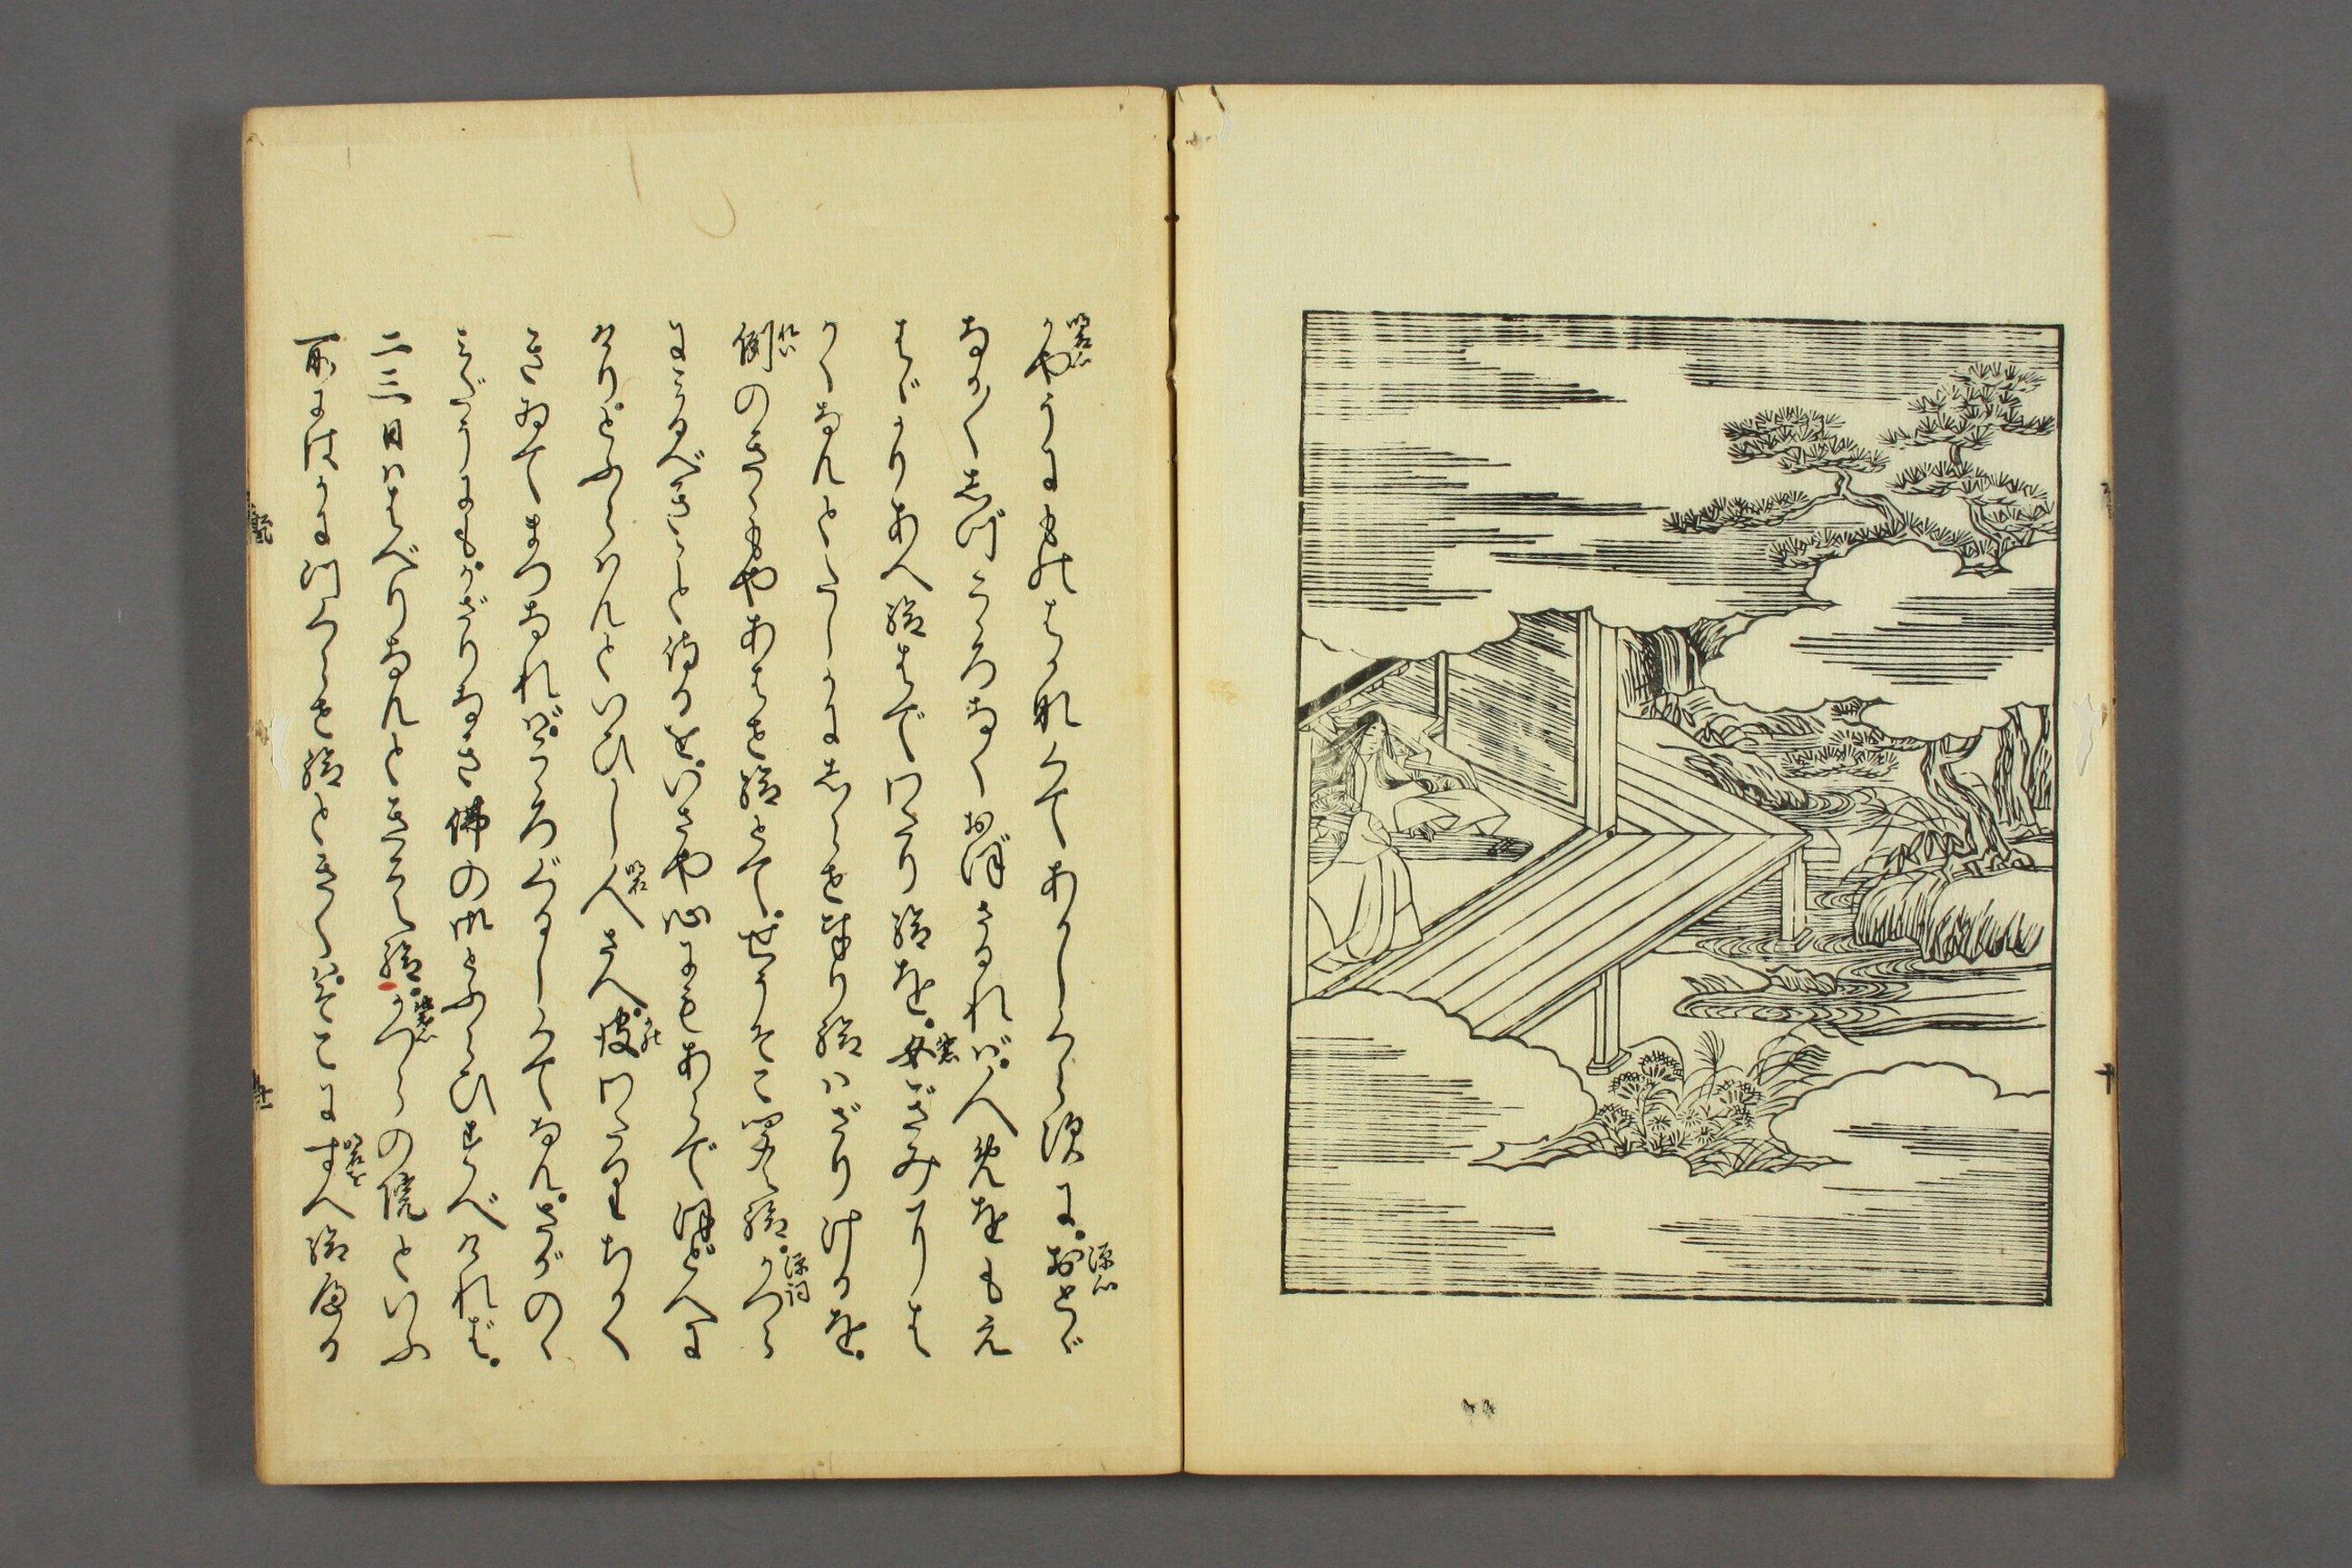 http://archive.wul.waseda.ac.jp/kosho/bunko30/bunko30_a0007/bunko30_a0007_0018/bunko30_a0007_0018_p0012.jpg